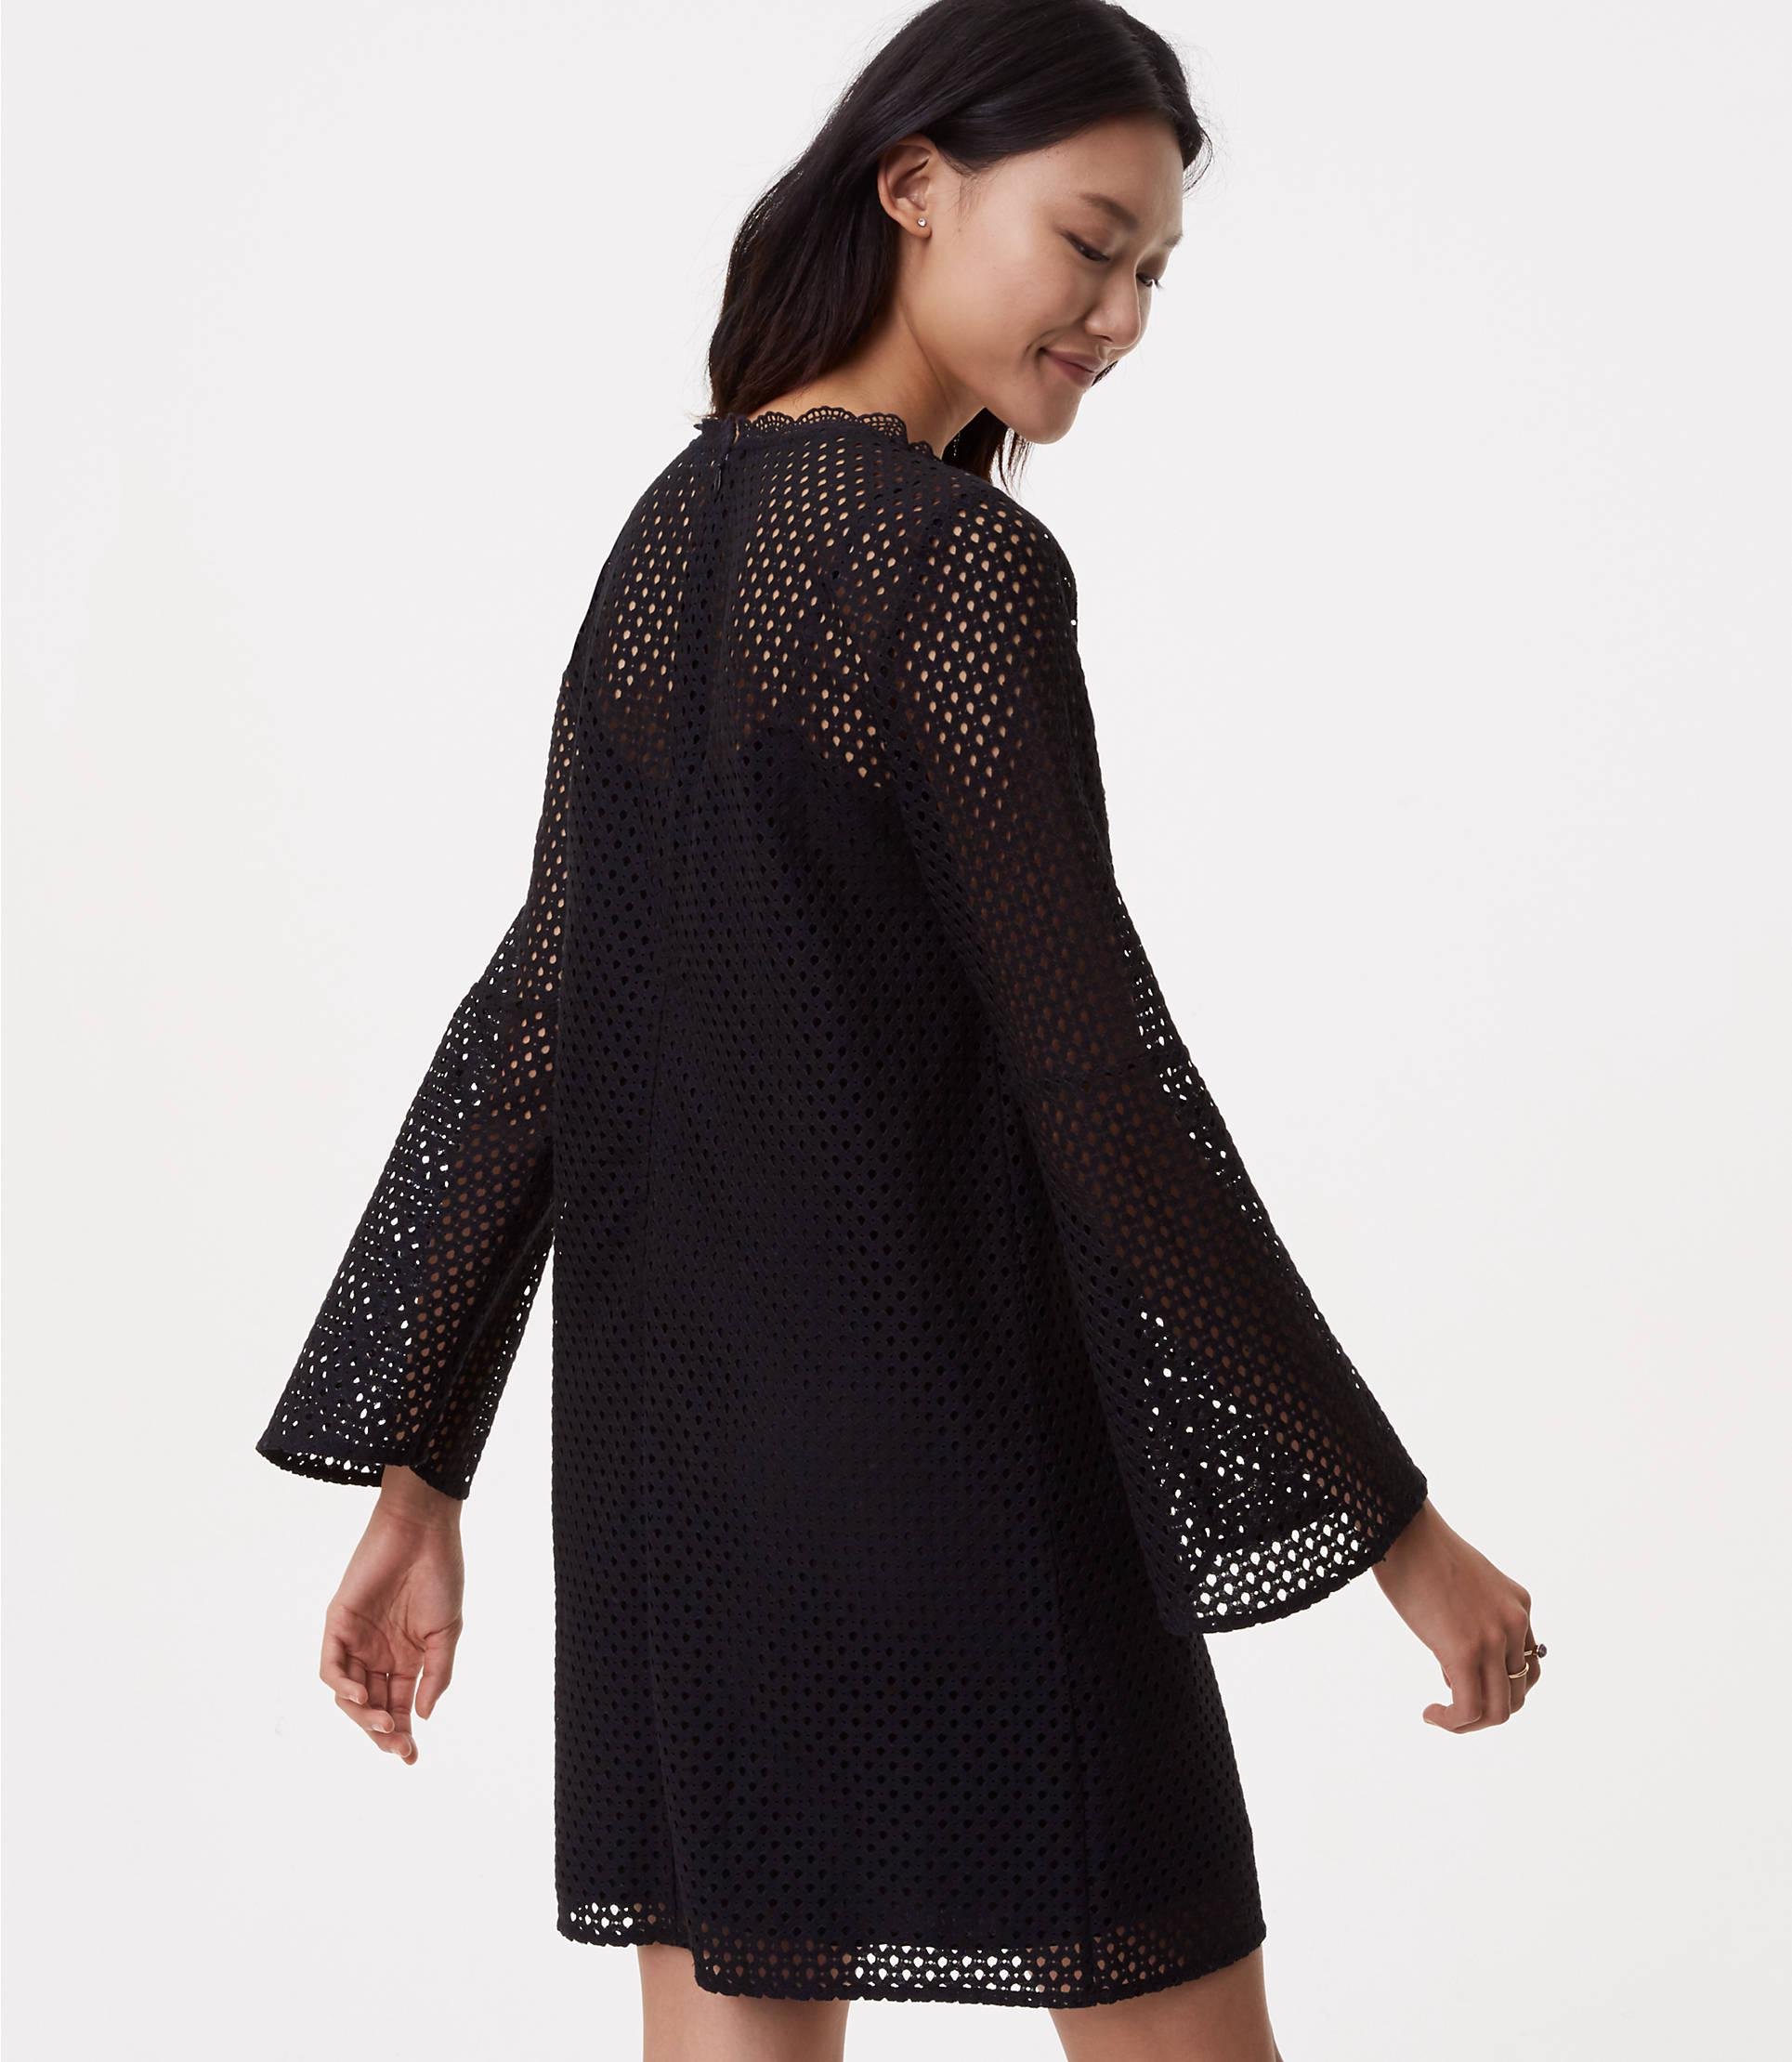 285b30f17d9e LOFT Petite Lace Mesh Bell Sleeve Dress in Black - Lyst